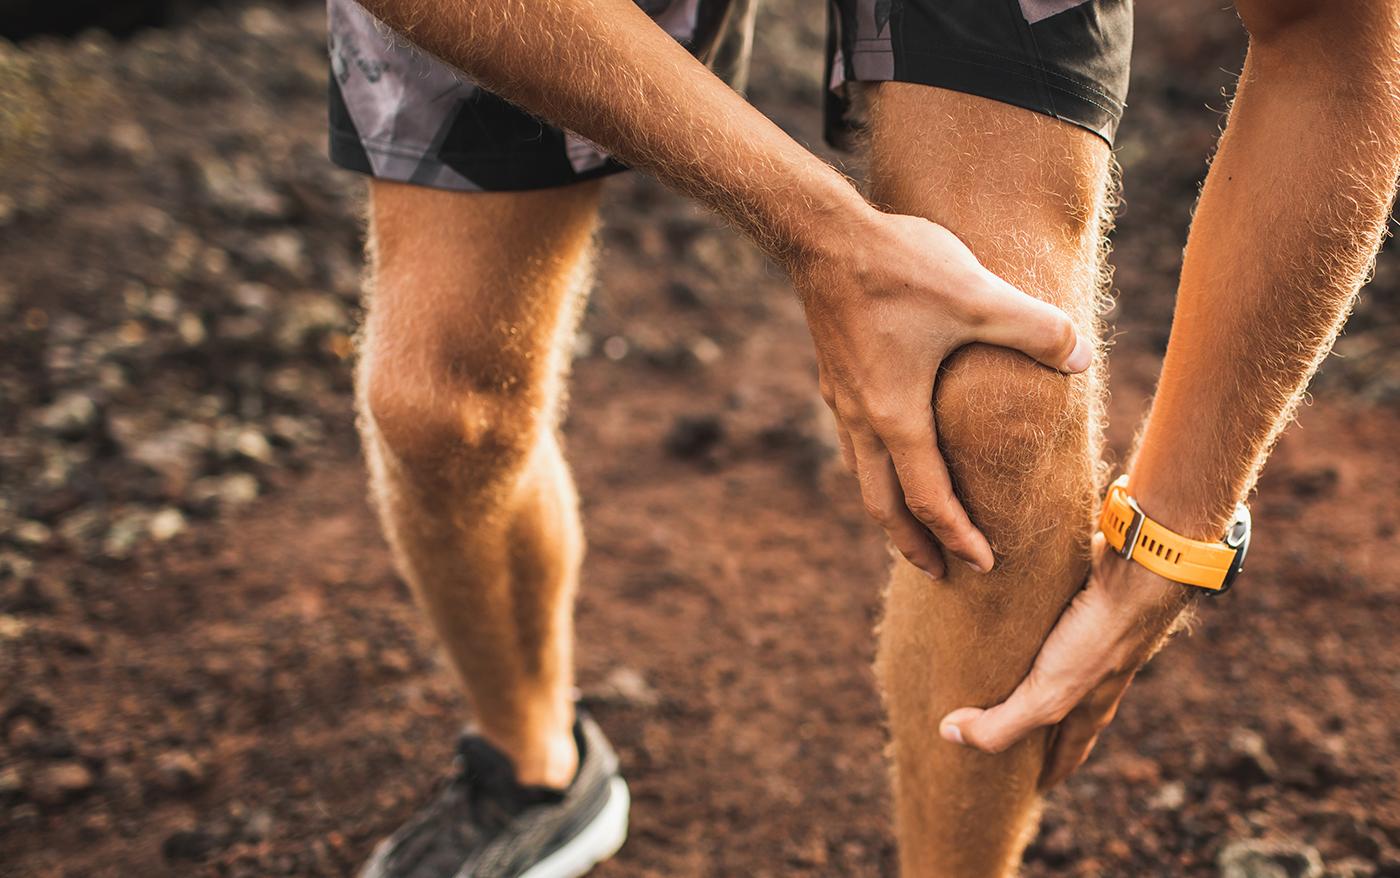 Bliv klogere på springerknæ | Fysioterapi i Eventyrsport